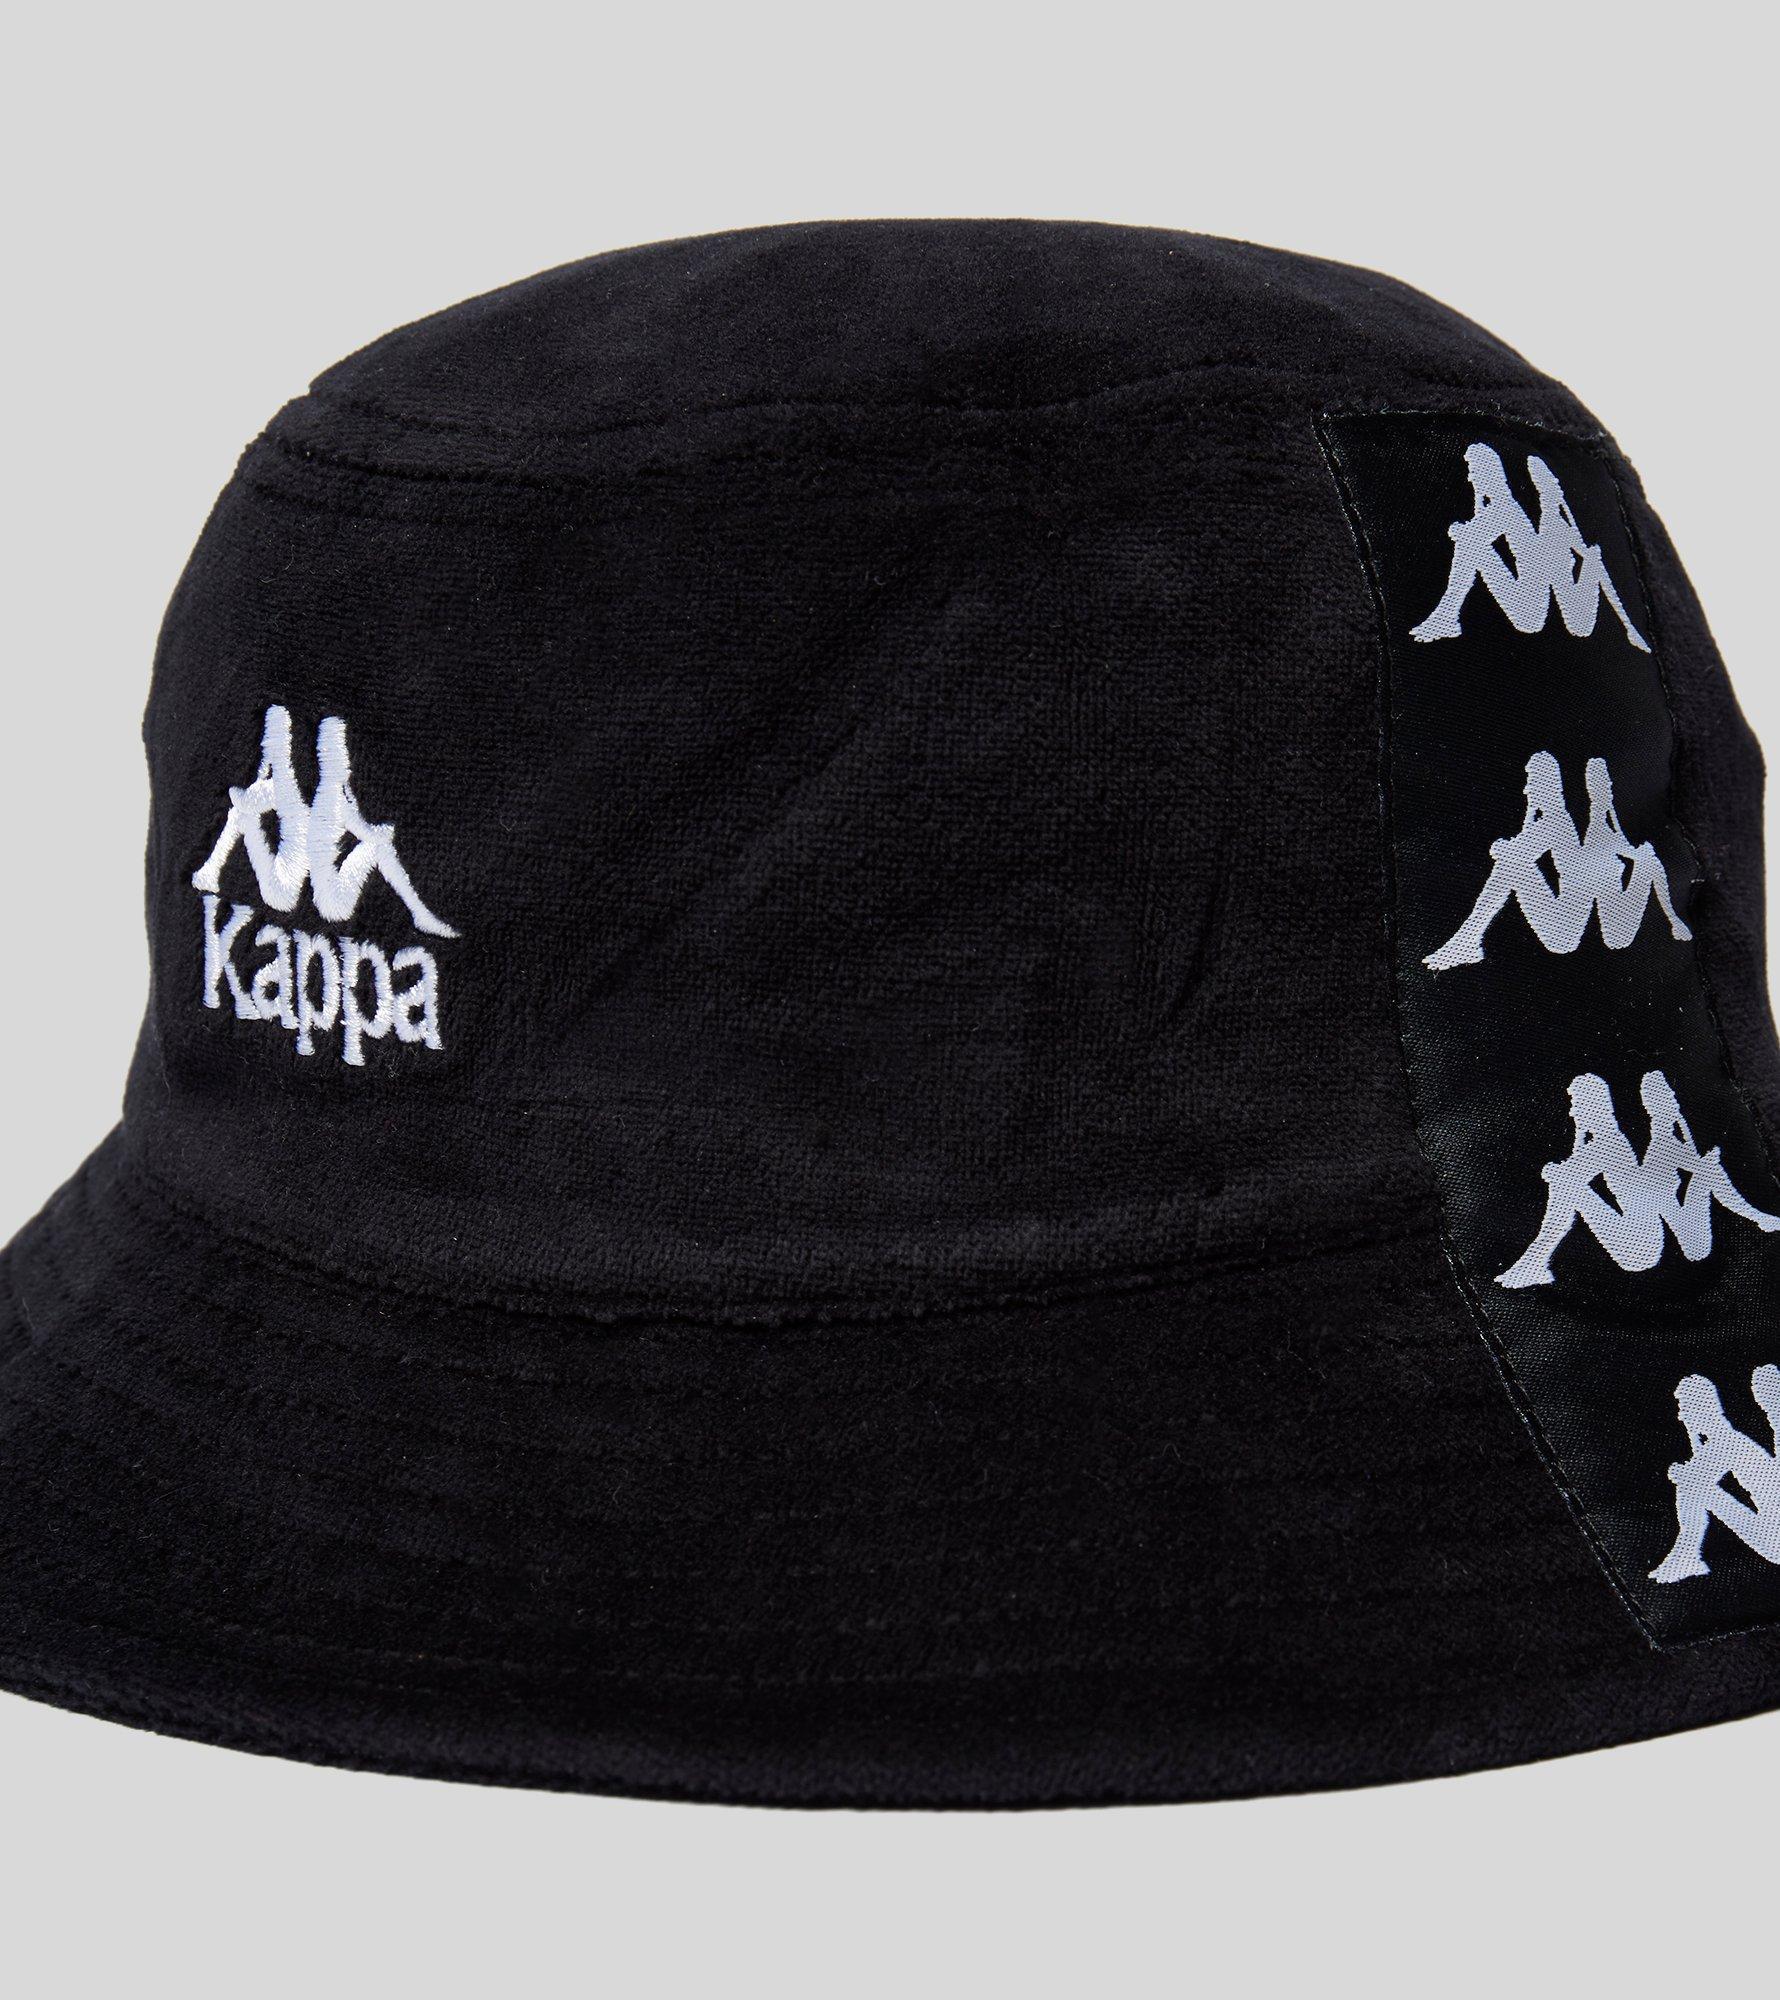 5425c34f866b7 Kappa Authentic Ayumen Bucket Hat in Black for Men - Lyst